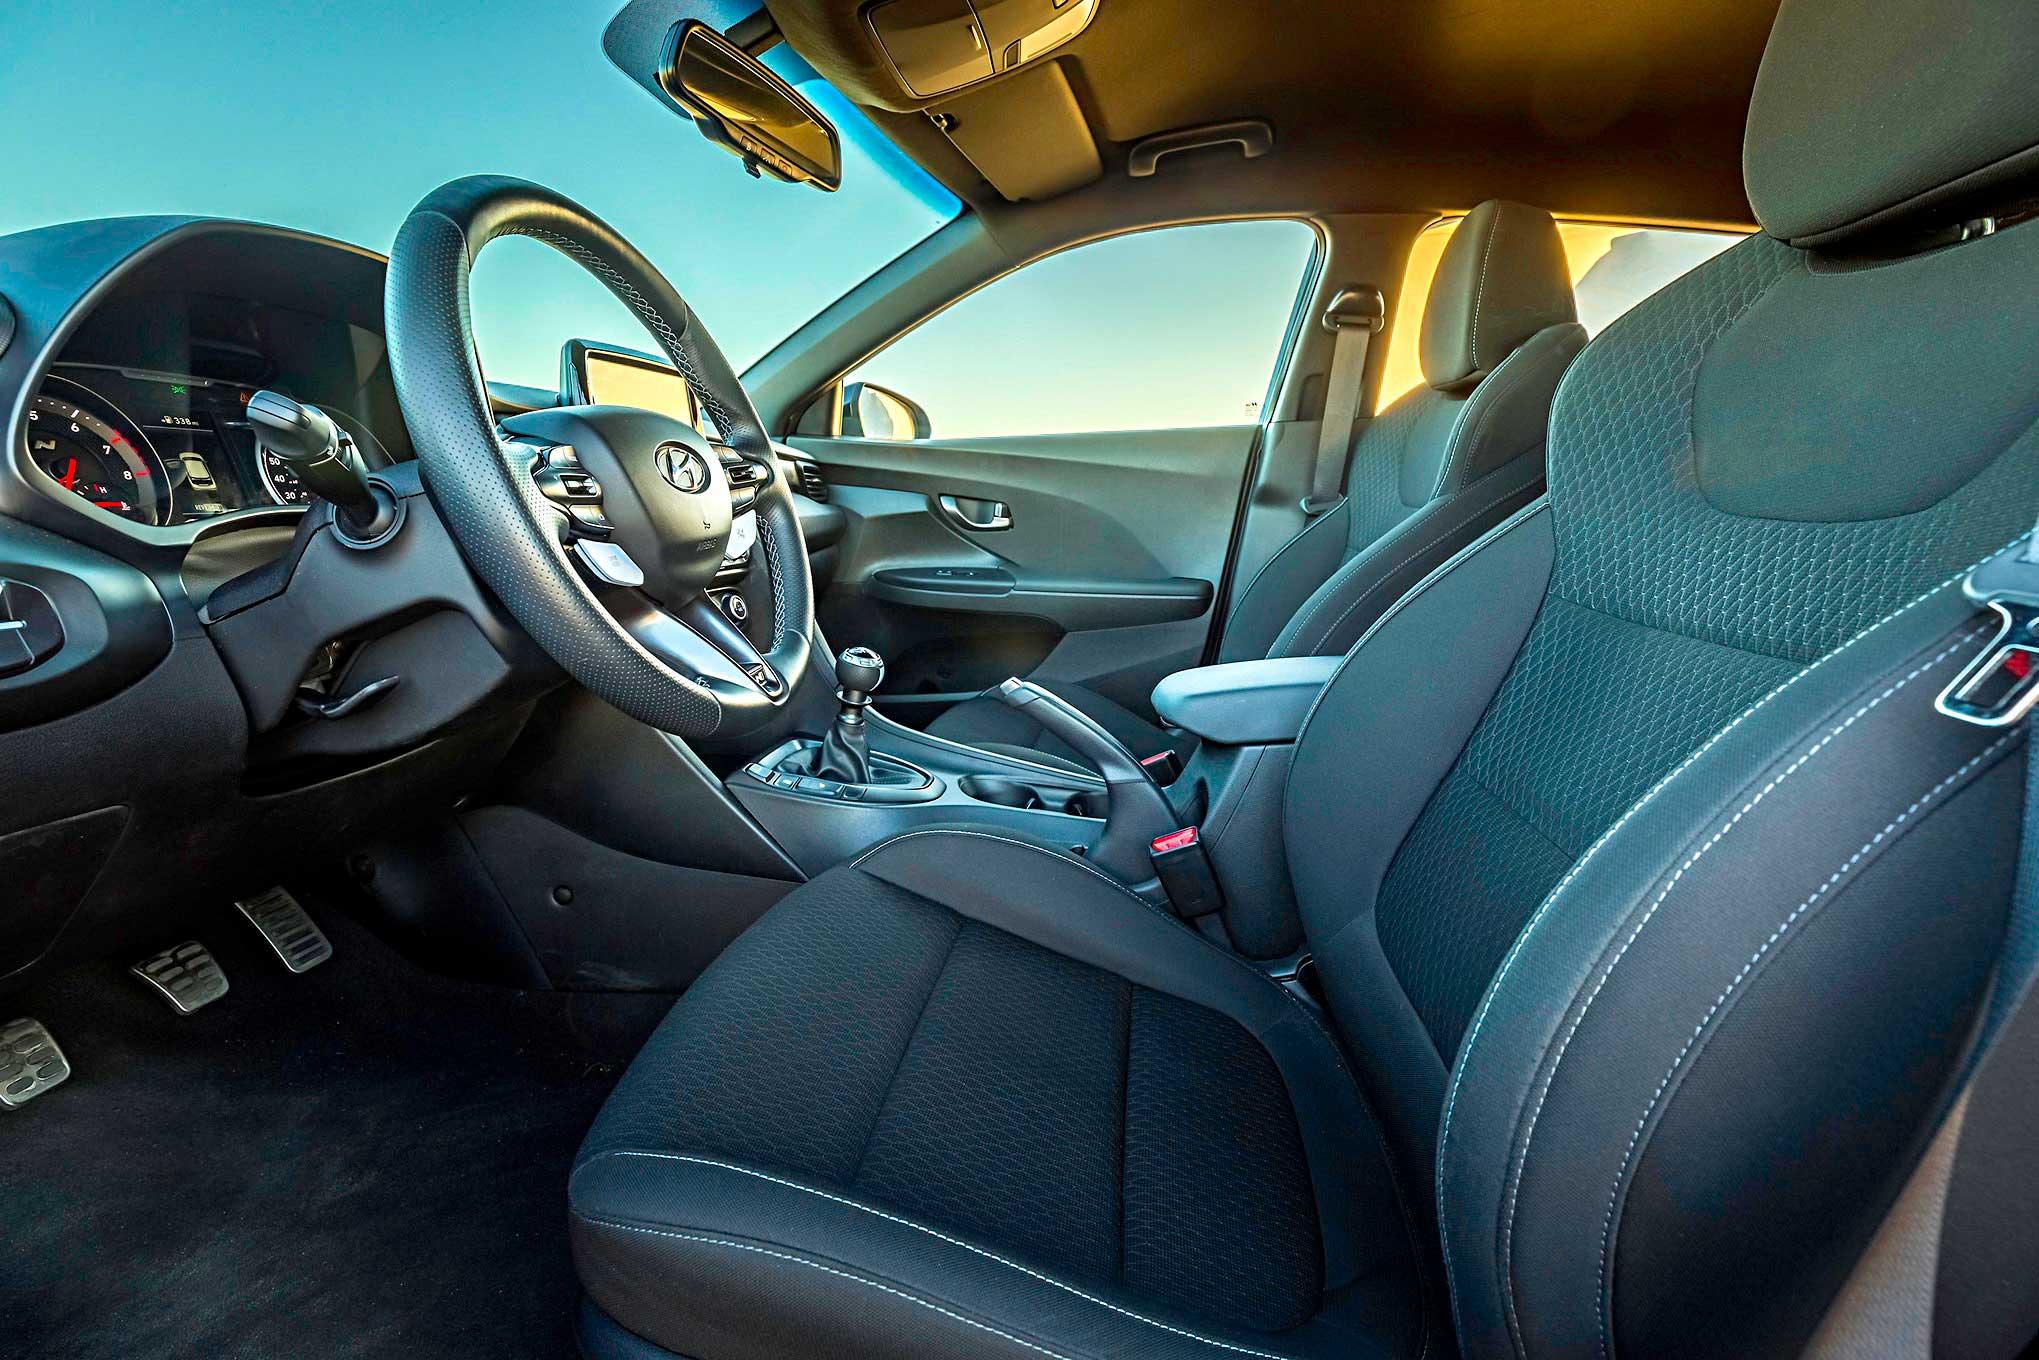 2019 Hyundai Veloster N - First Drive